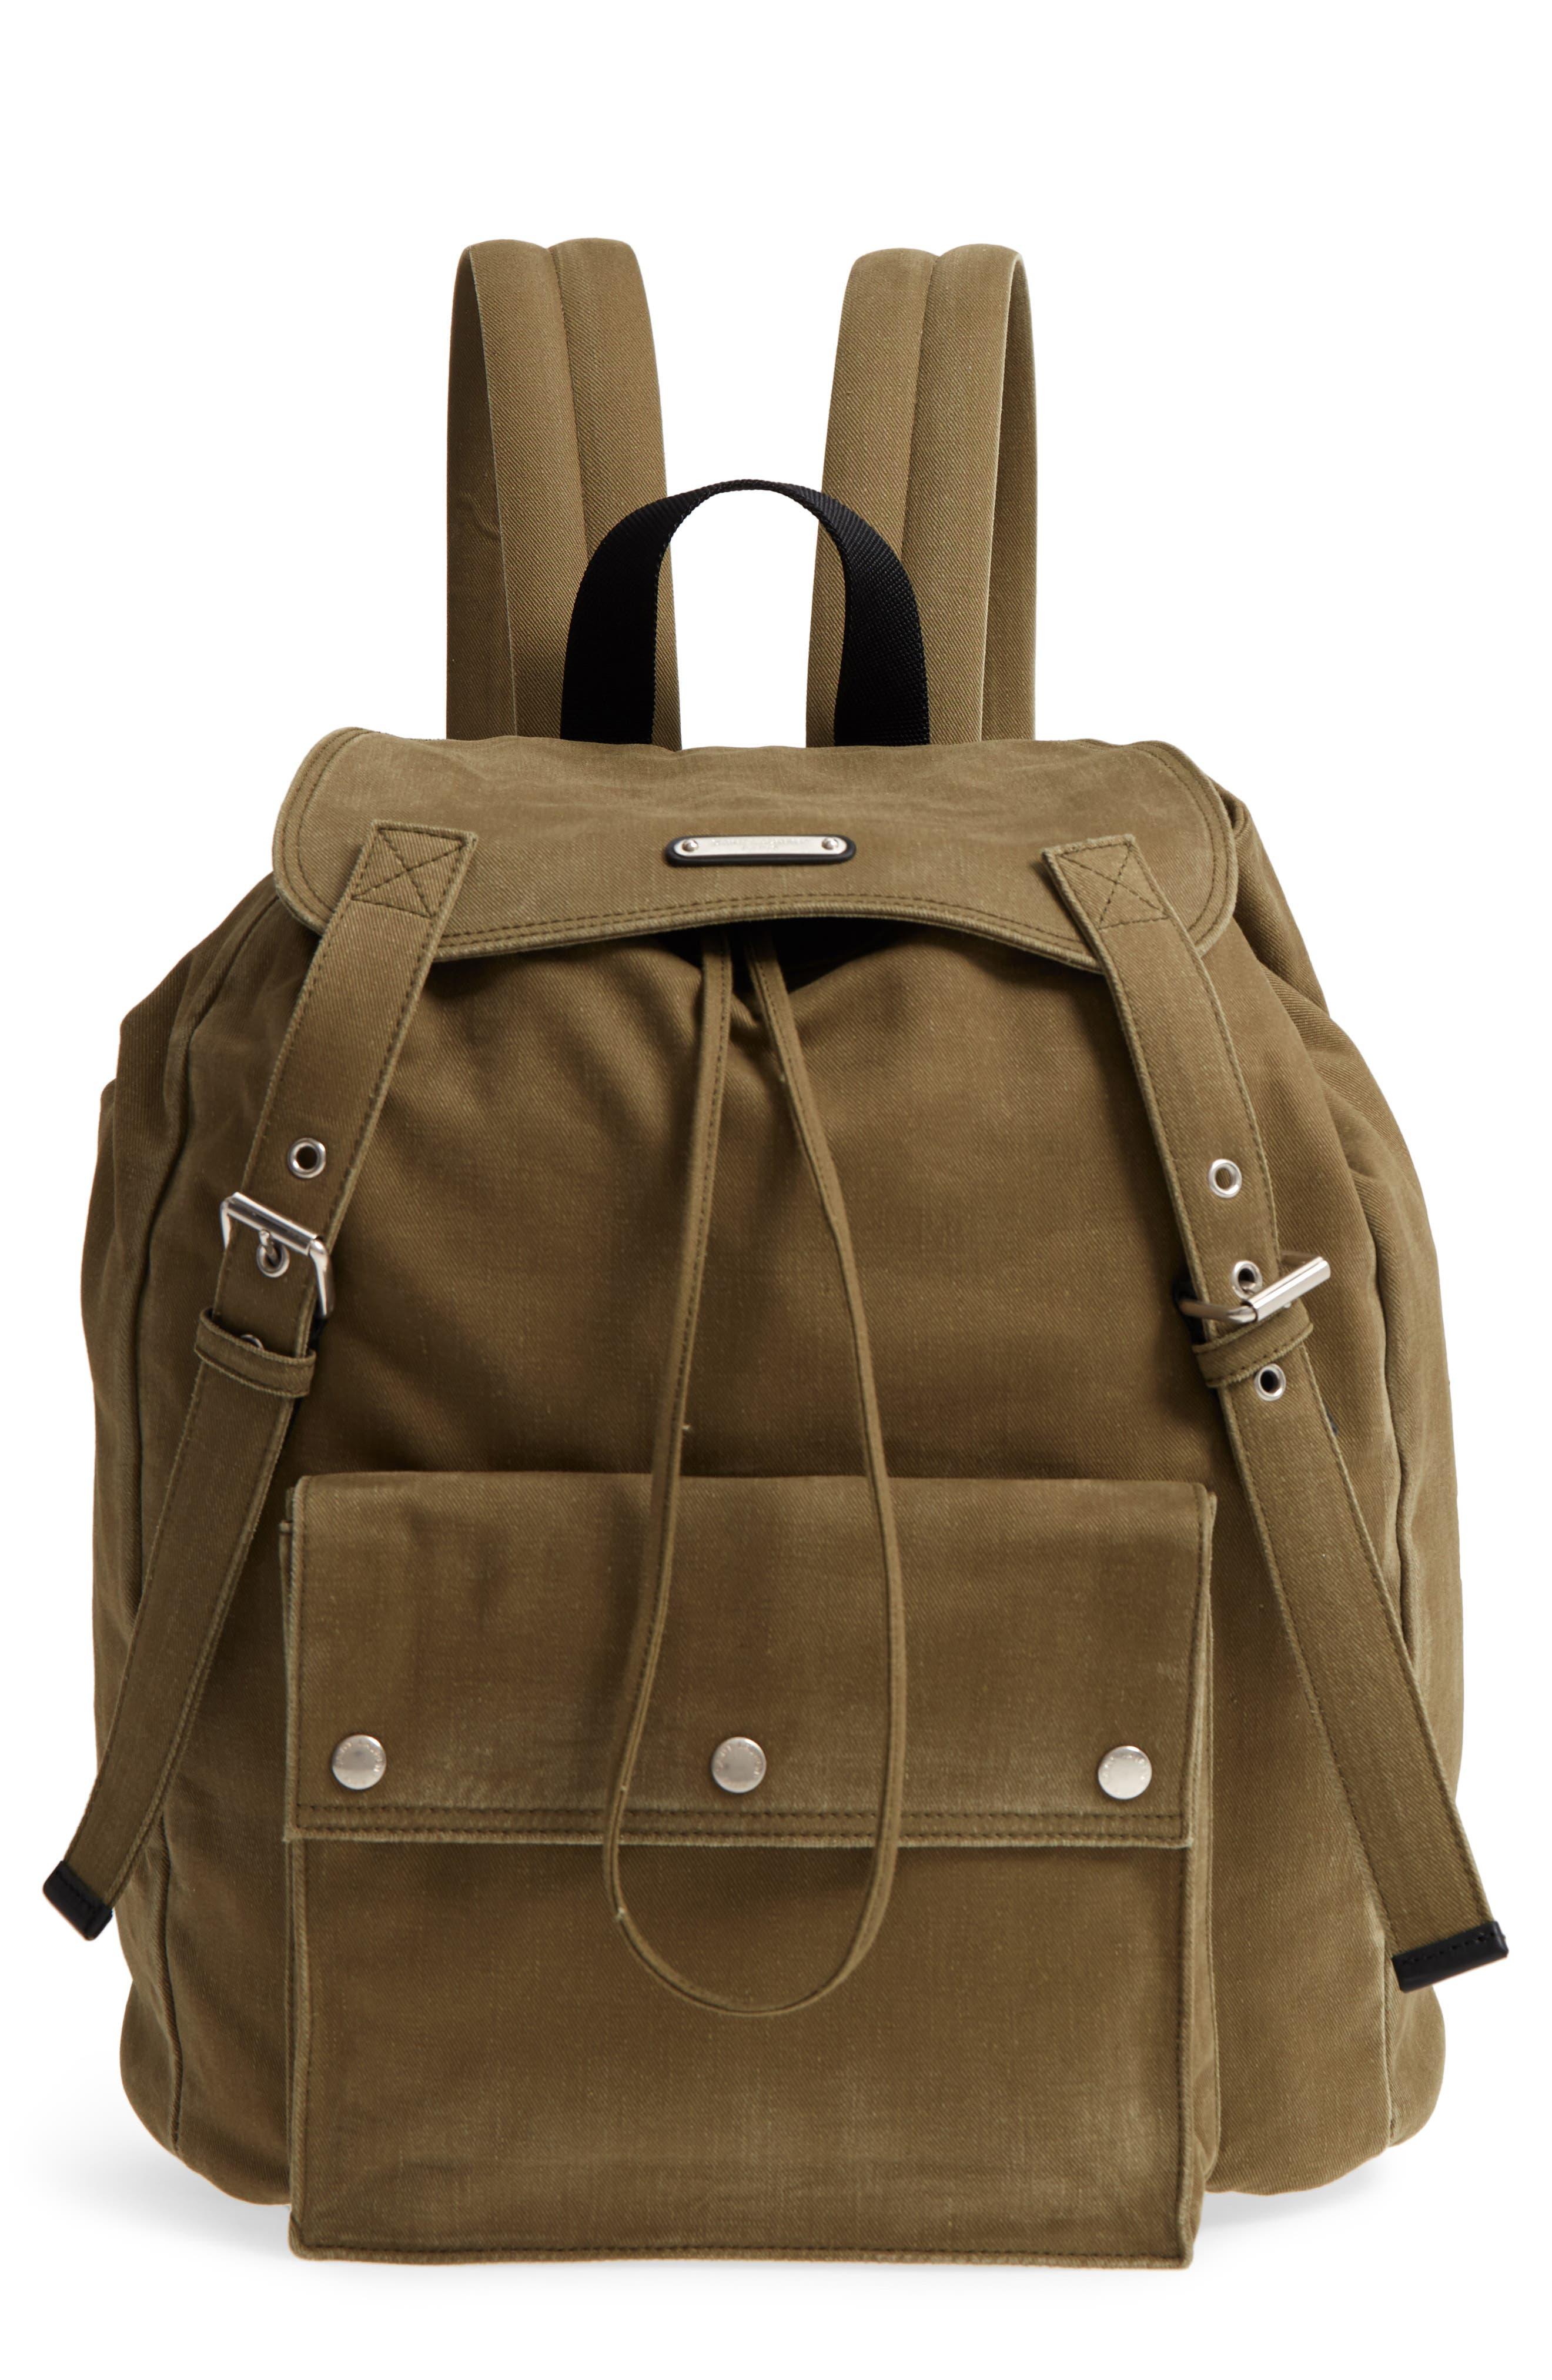 Saint Laurent Noe Flap Backpack